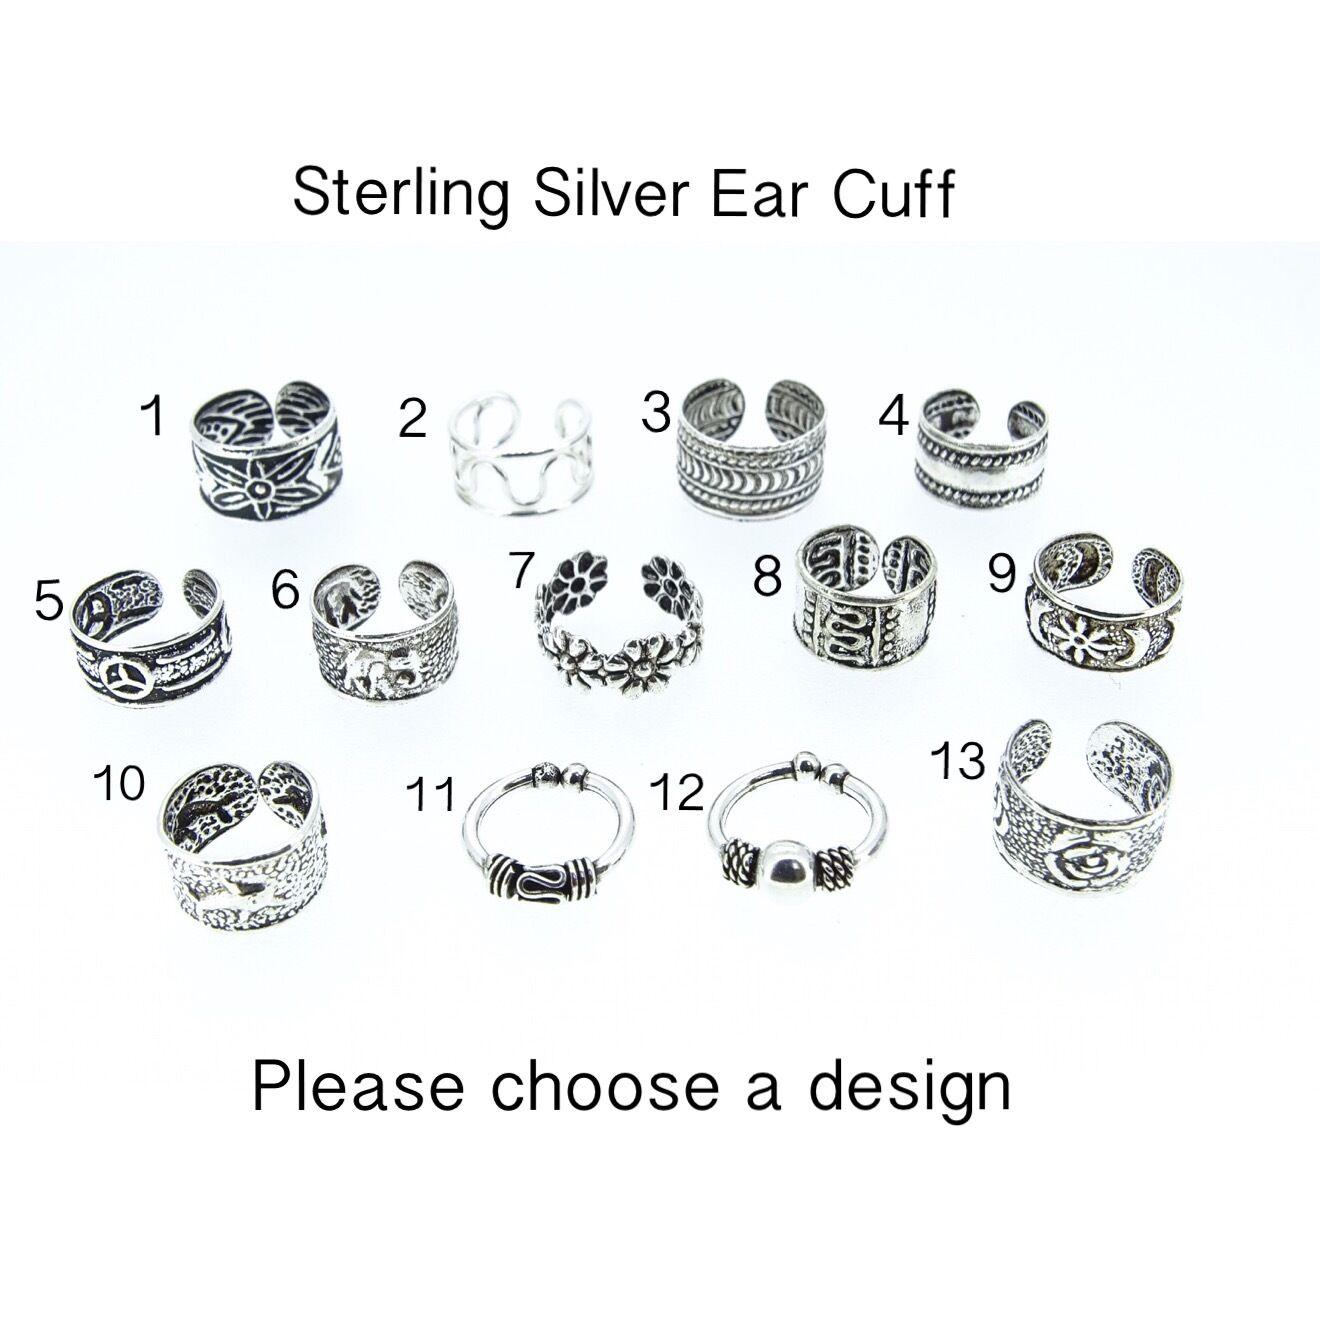 Jewellery - Sterling Silver Ear Cuff Huggy Bali Fake Earring Septum Tragus Body Jewellery